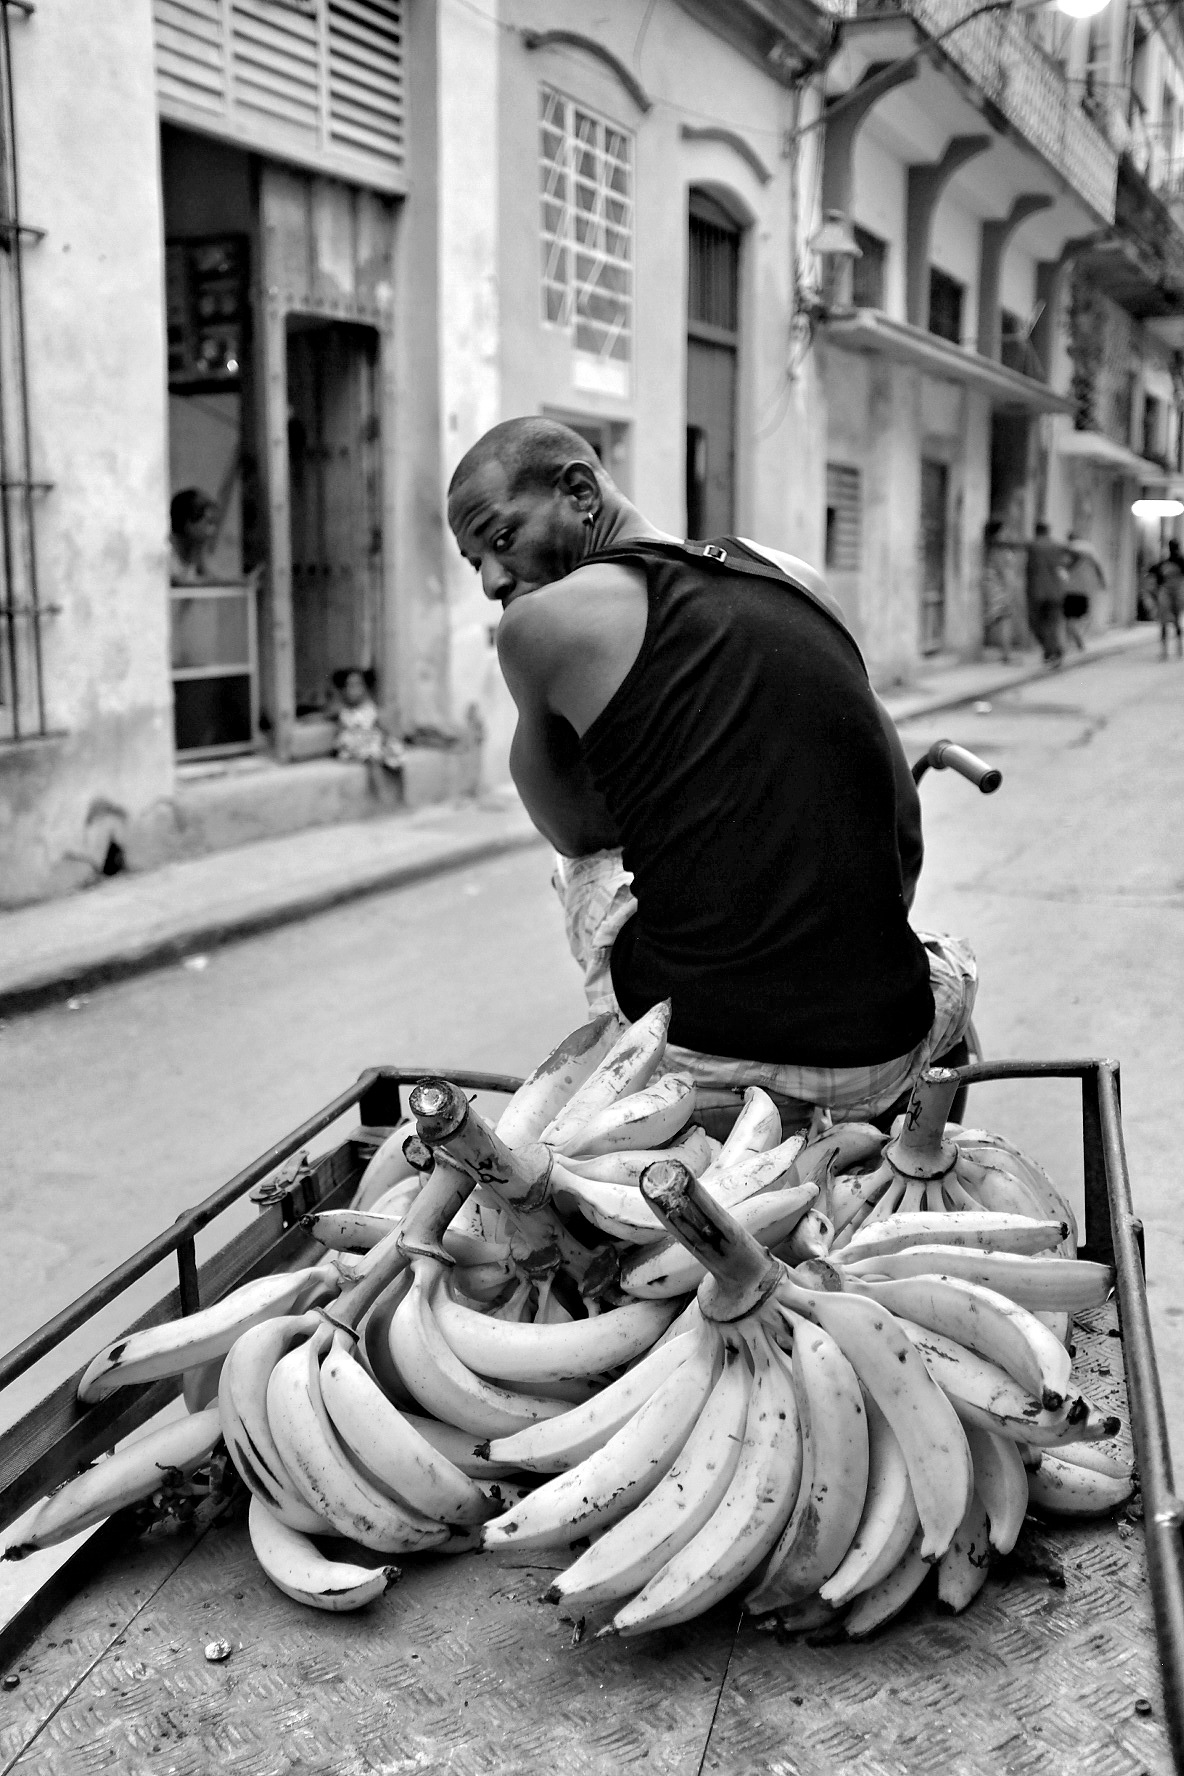 Banana cycle by Staraliska